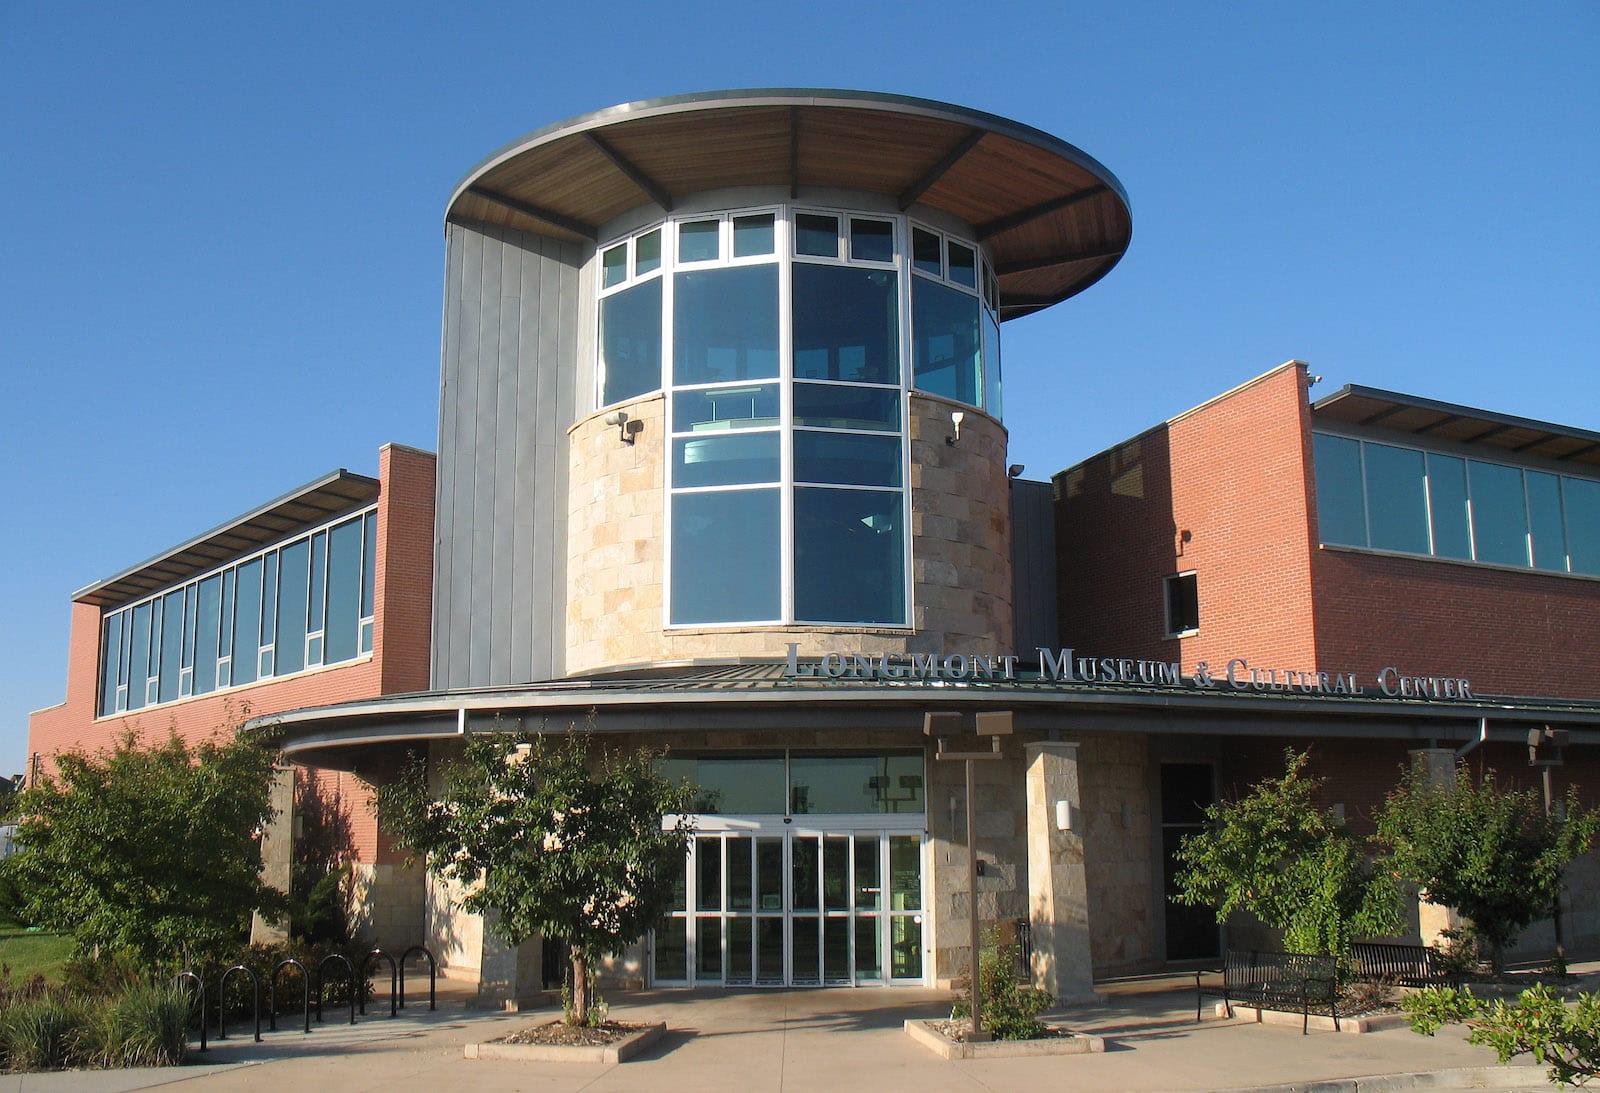 Longmont Museum in Longmont, CO